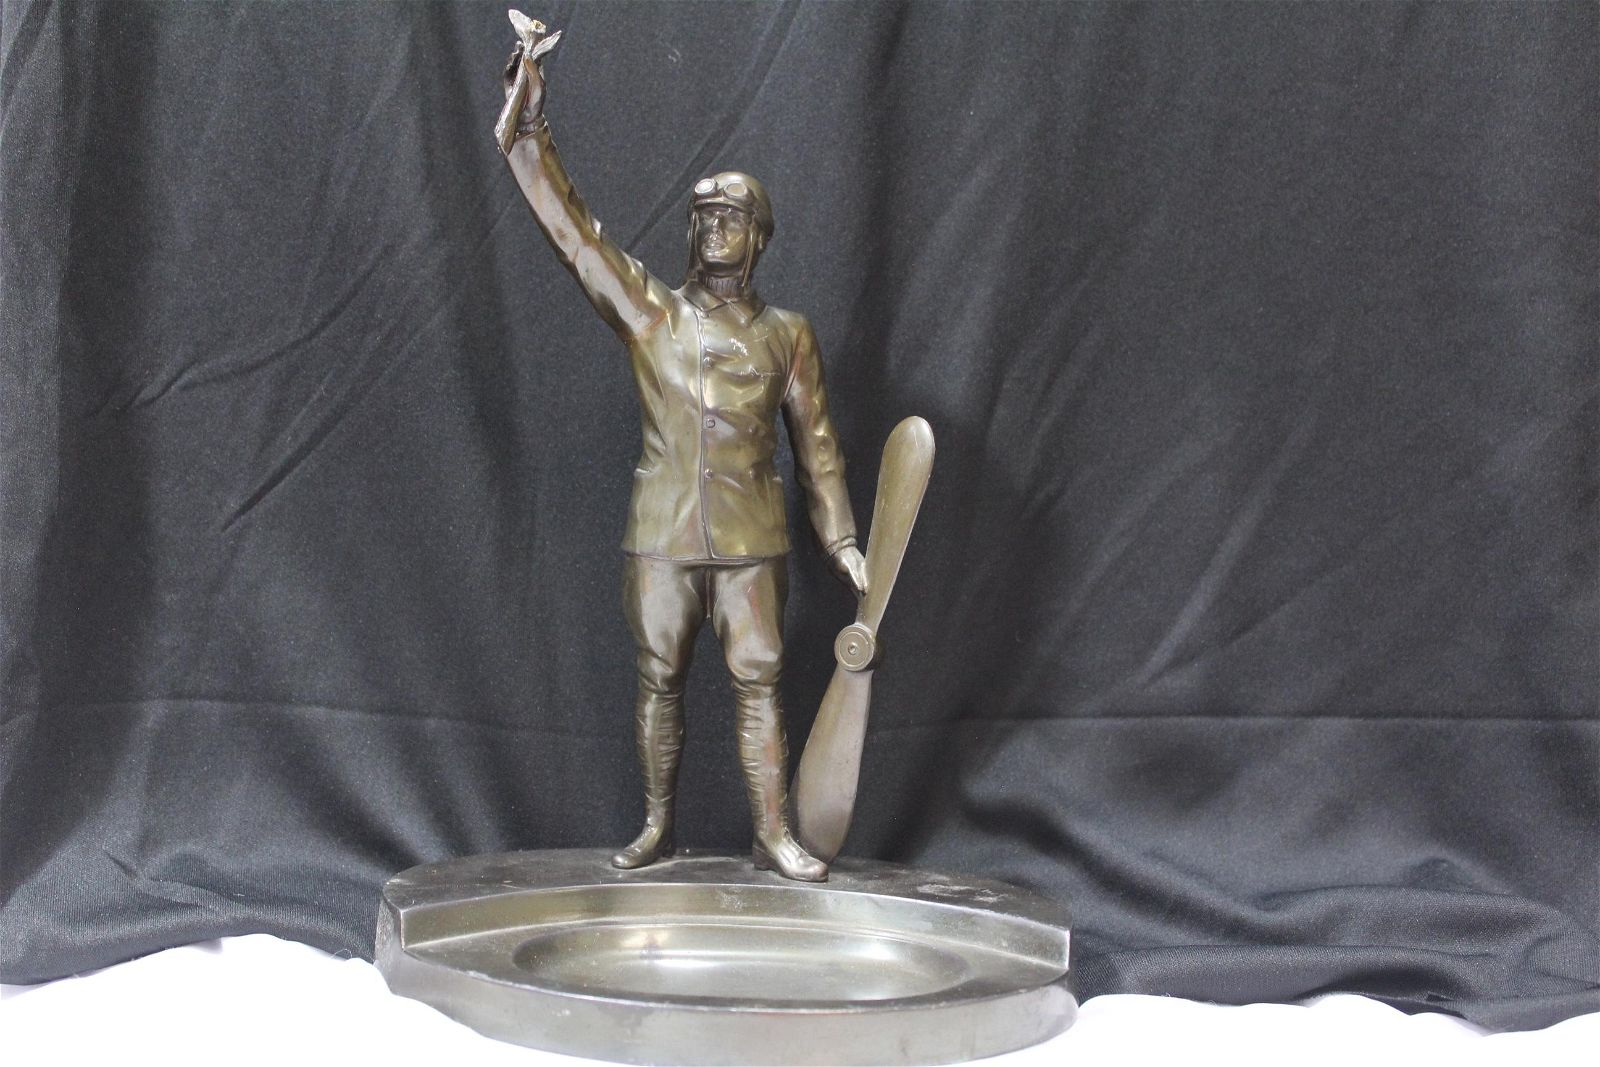 A Bronze or Metal Aviator Ashtray